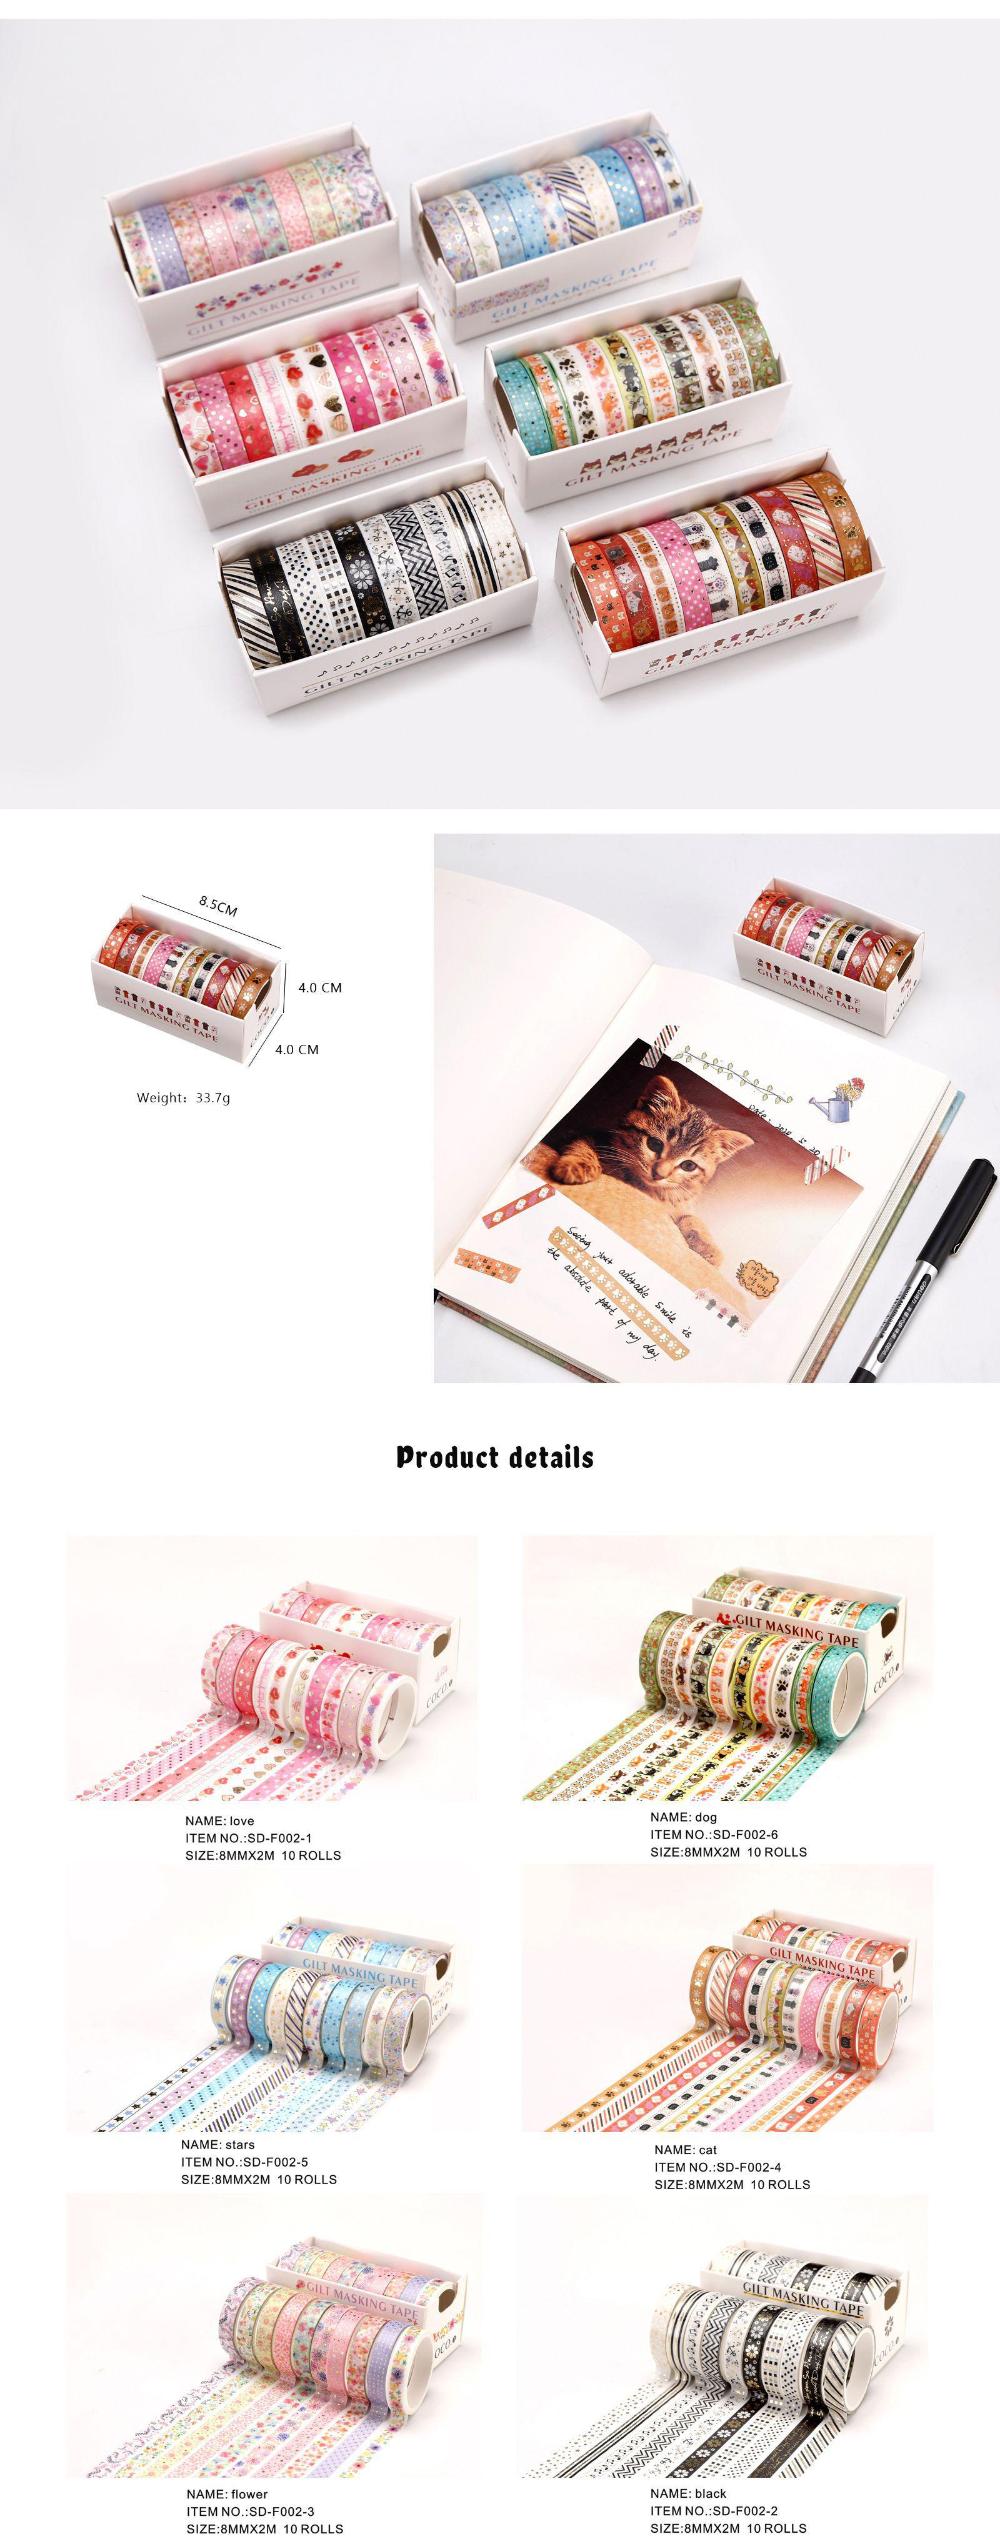 10Rolls/Set Foil Slim Washi Tape DIY Decoration Scrapbooking Planner Masking Tape Adhesive Tape Label Sticker Stationery|Office Adhesive Tape| - AliExpress